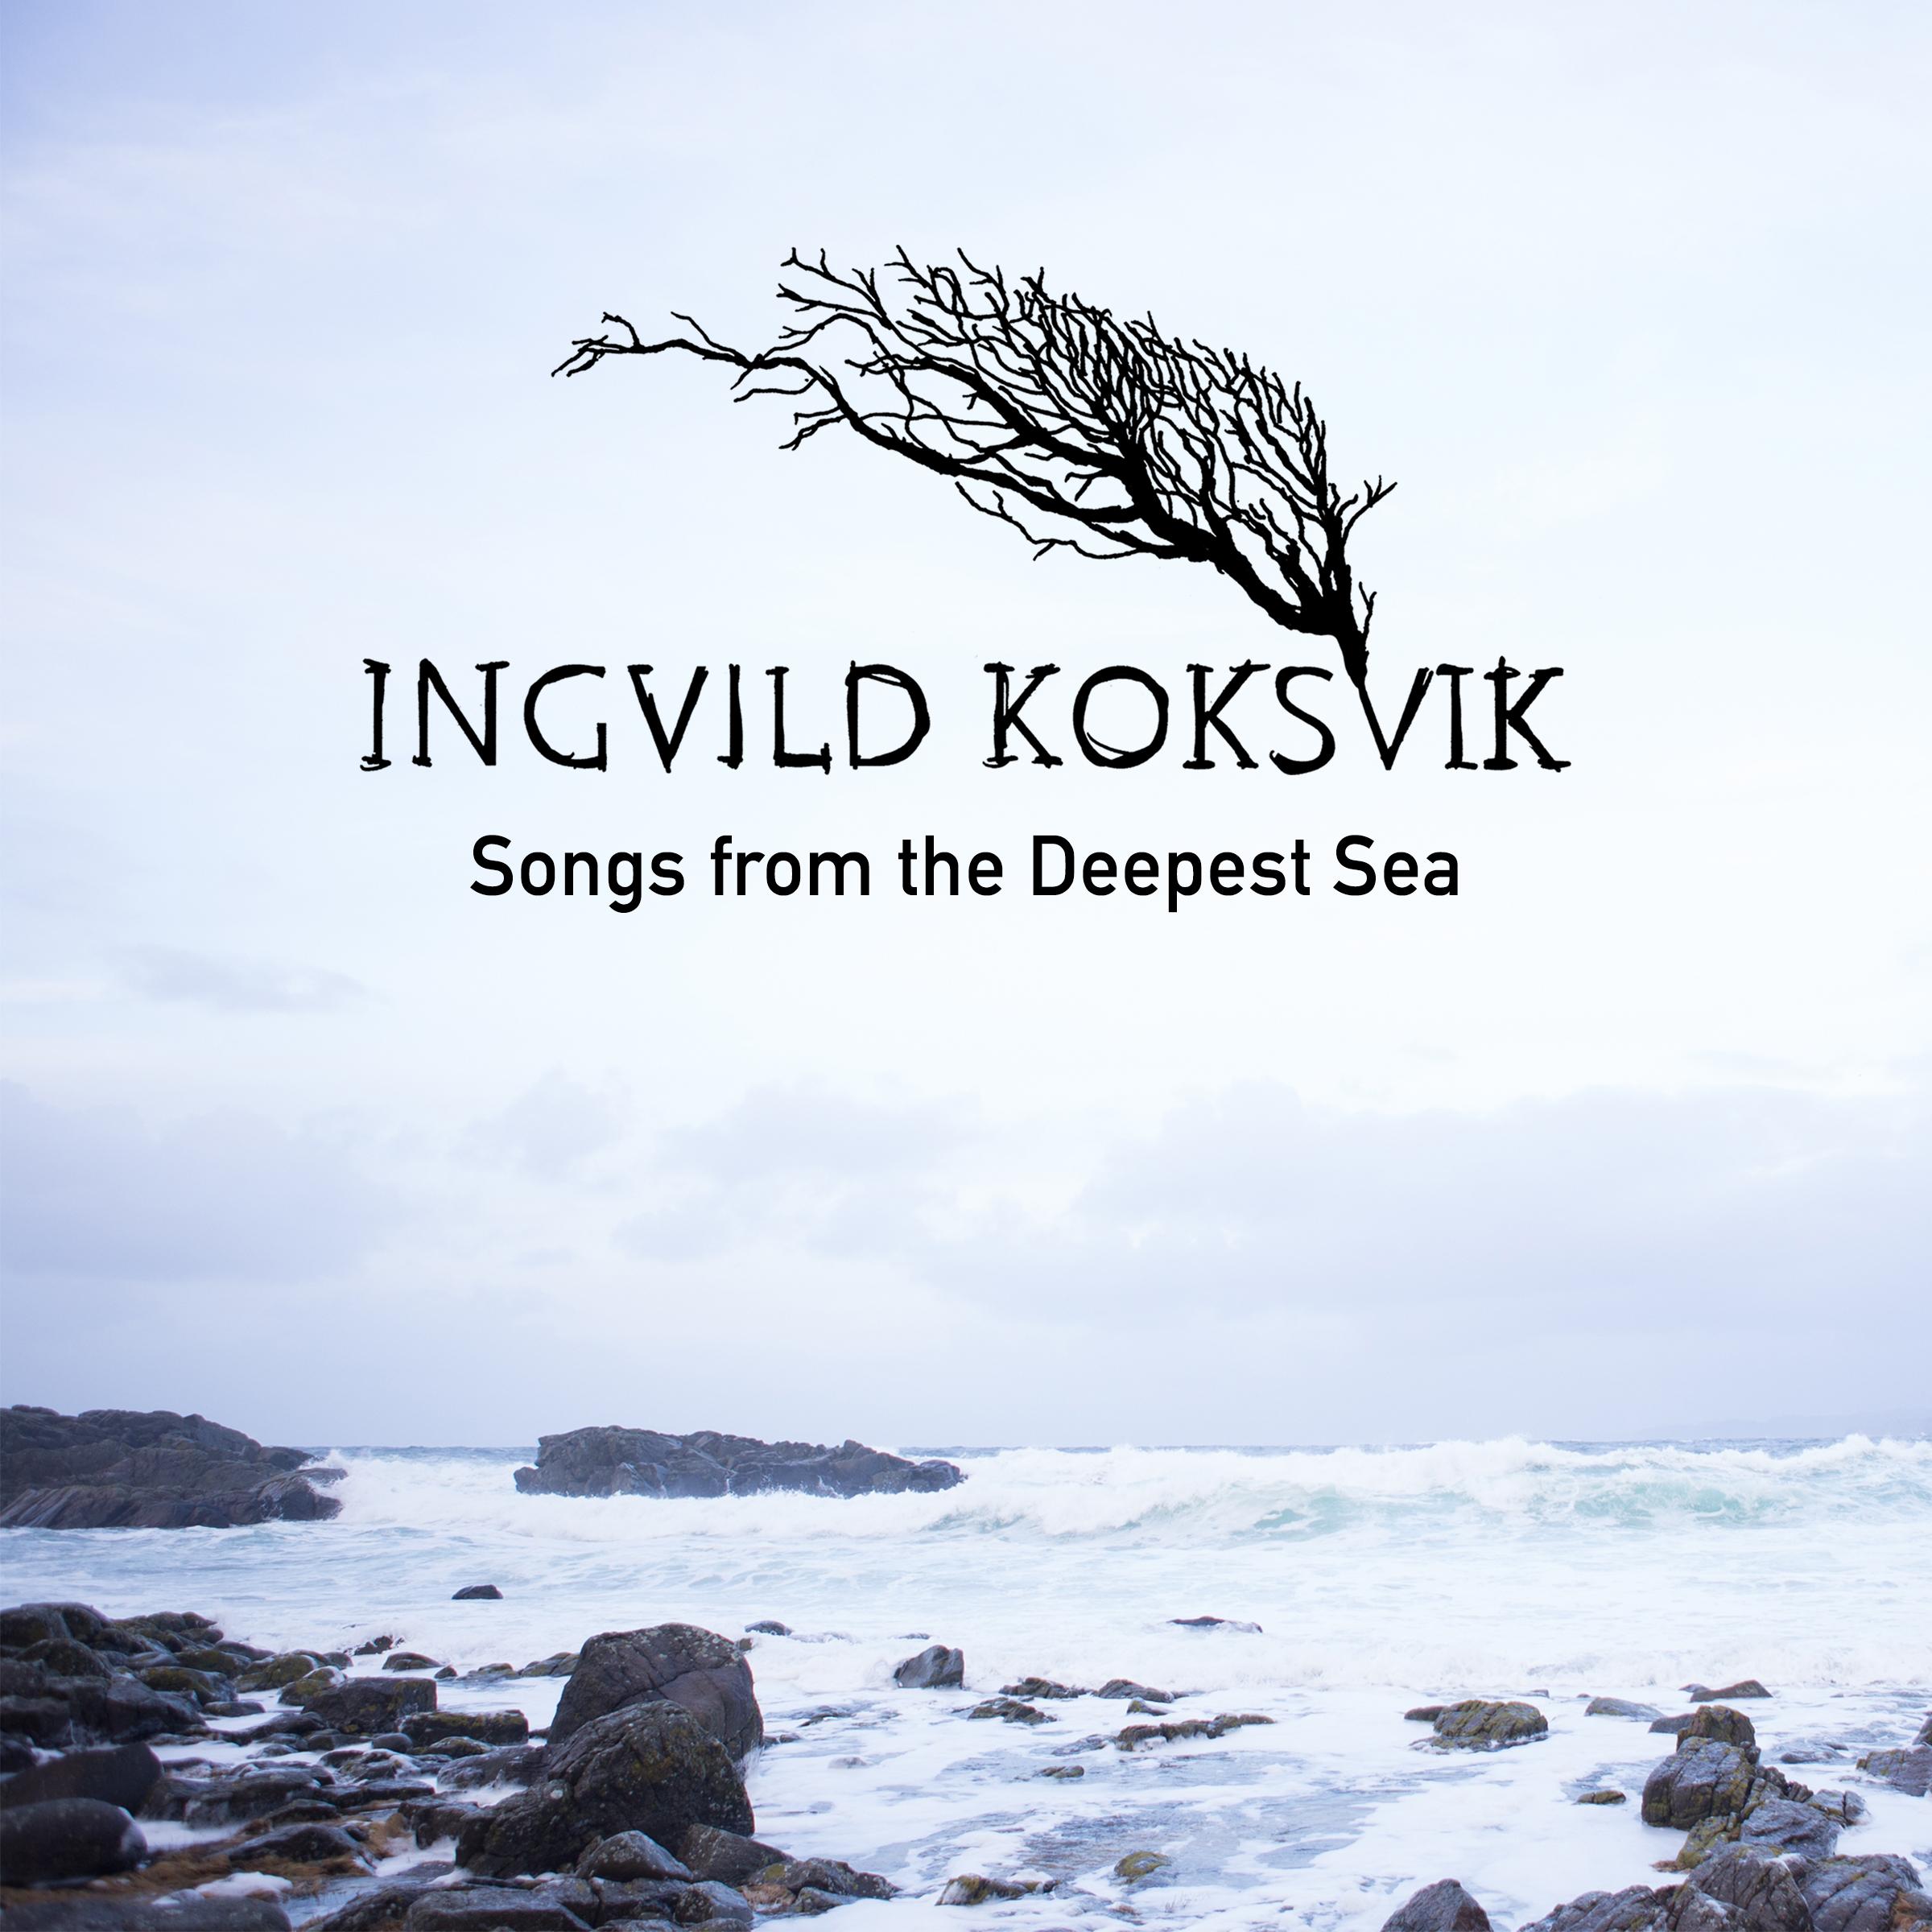 Songs from the Deepest Sea EP - Ingvild Koksvik